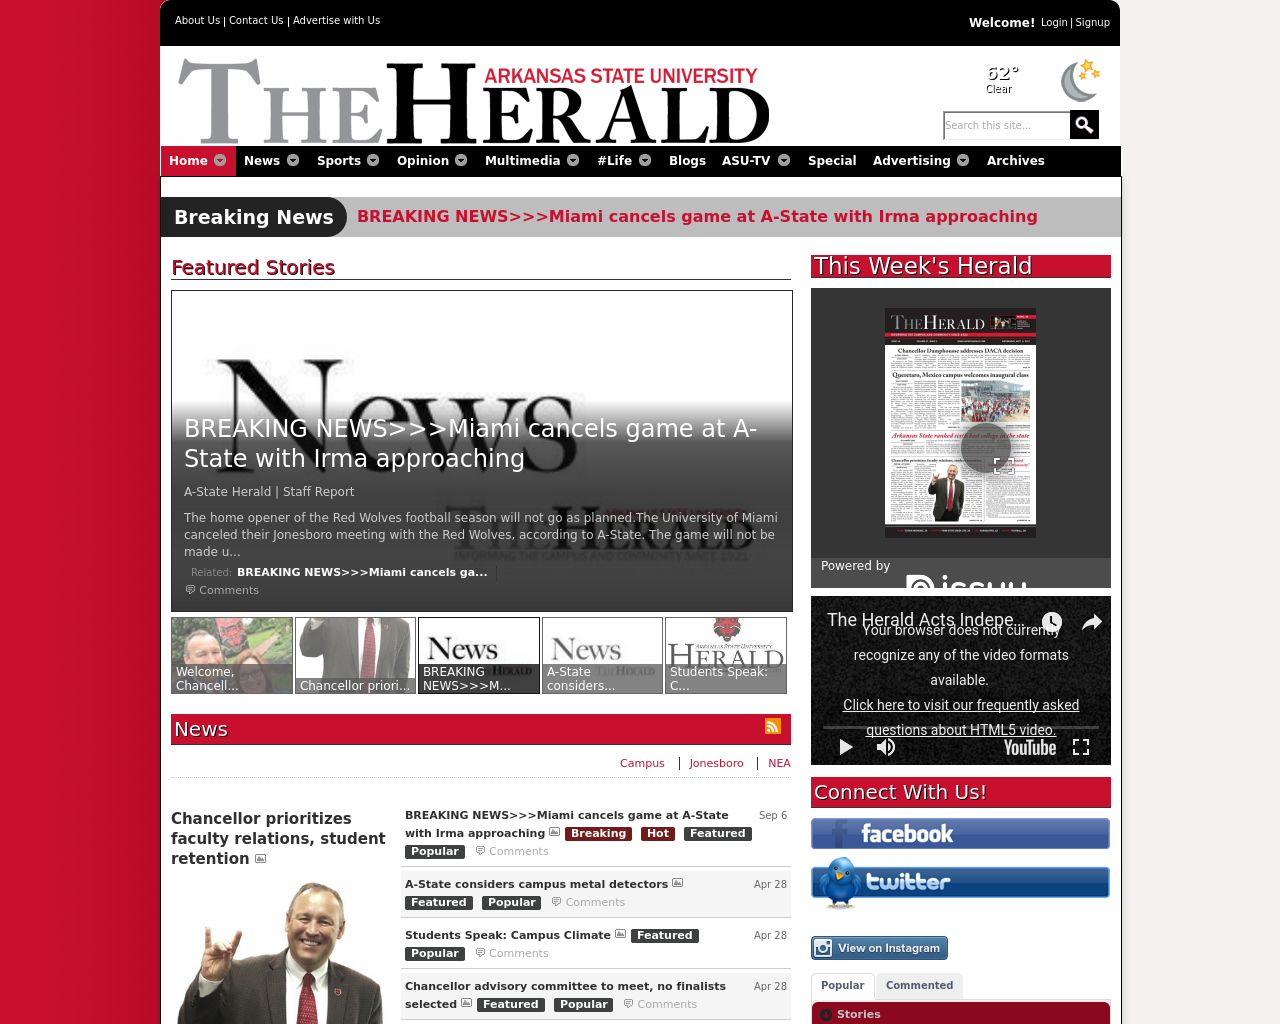 Arkansas-State-University-Herald-Advertising-Reviews-Pricing